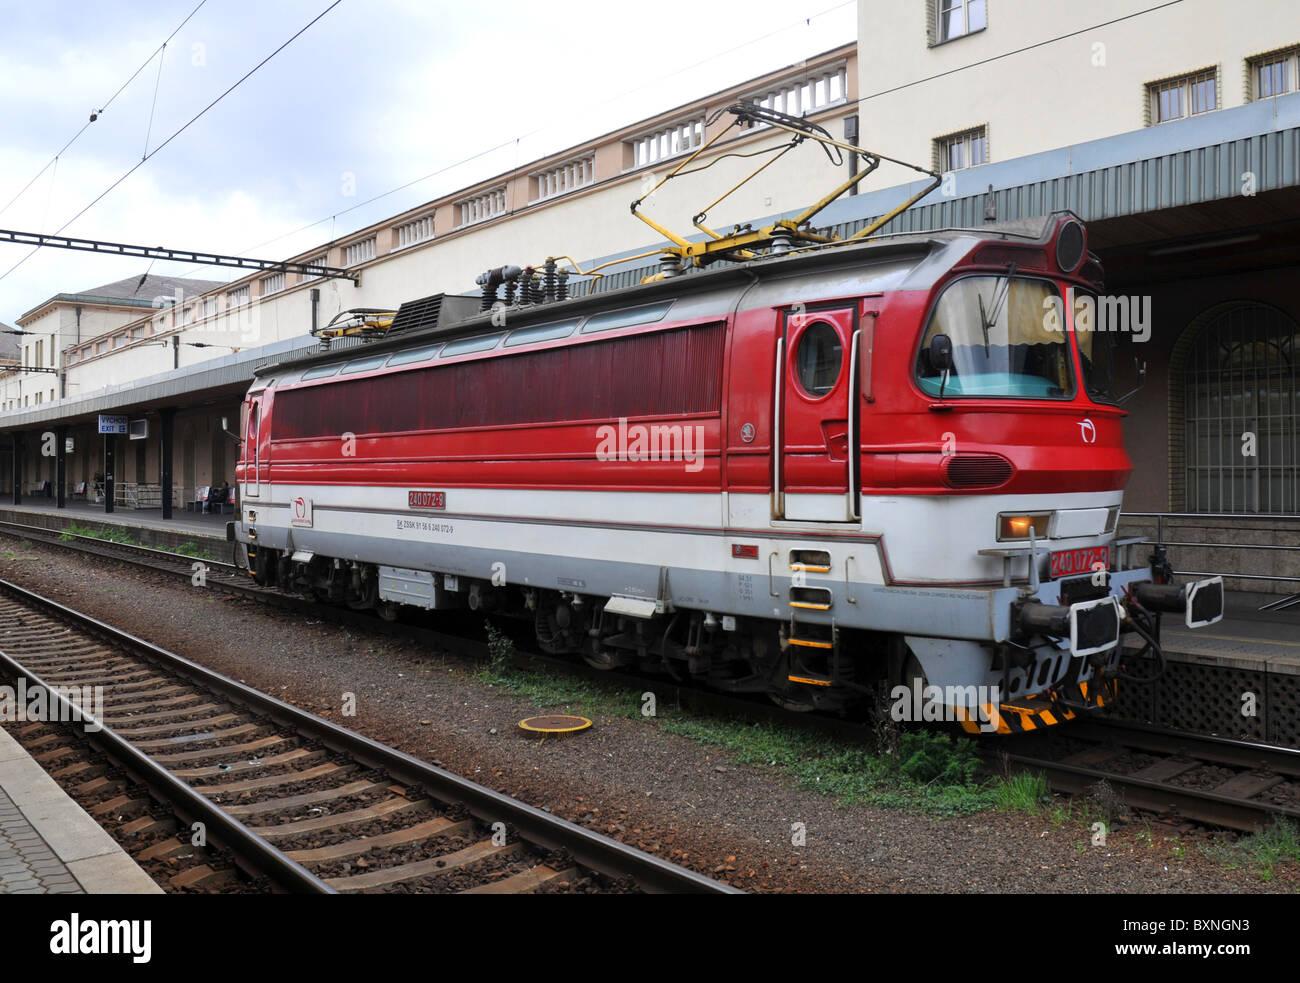 Railway engine at the main station, Bratislava, Slovakia, Europe - Stock Image